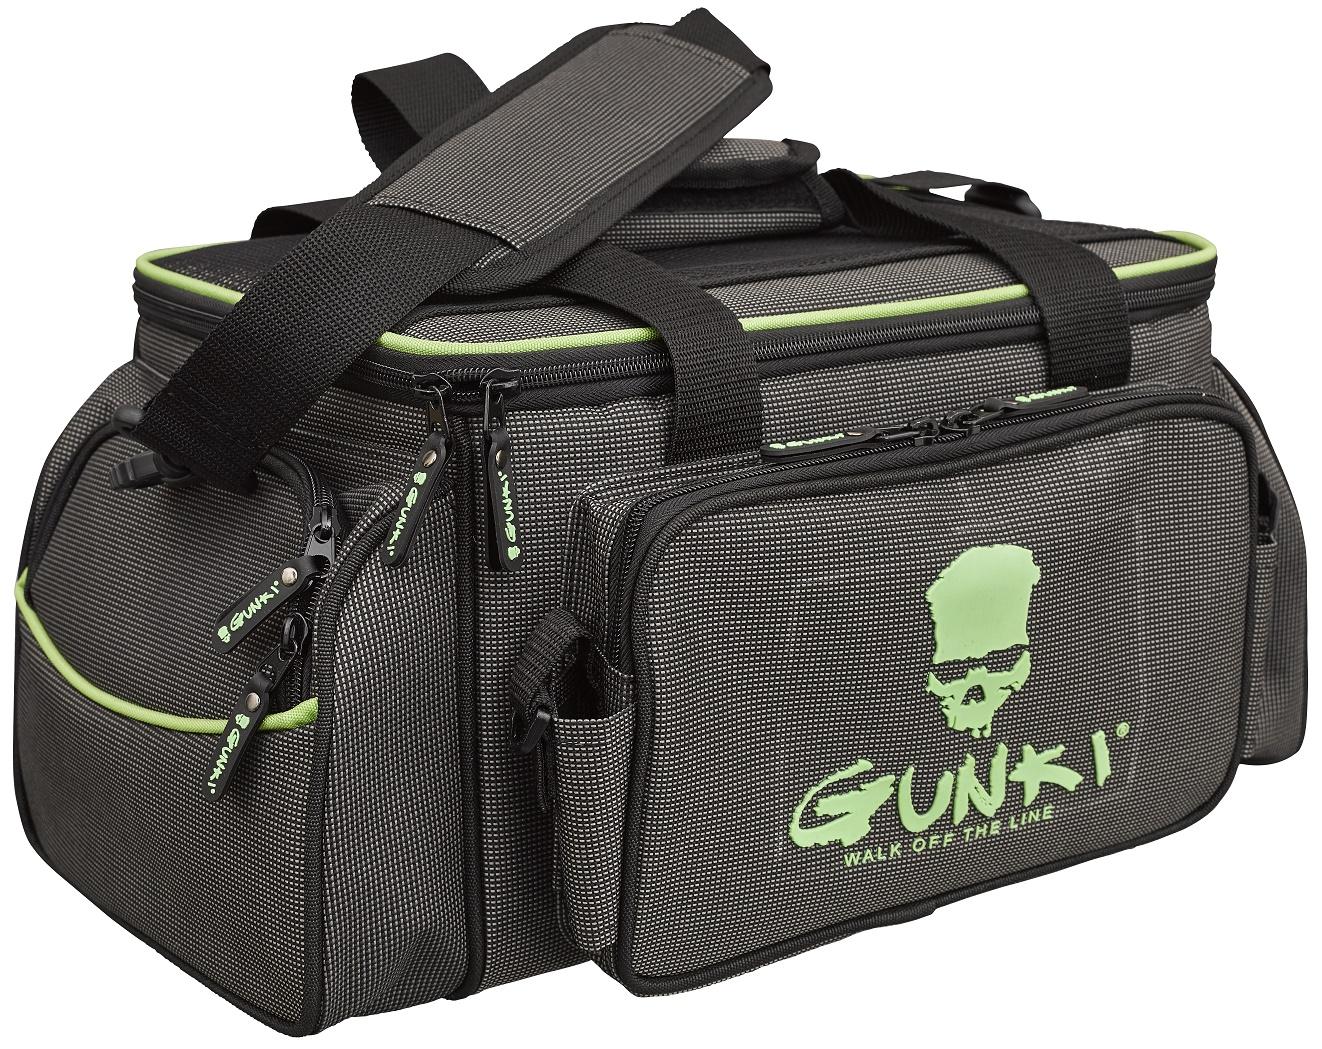 Iron-T Box Bag UP-Zander Pro (taška)